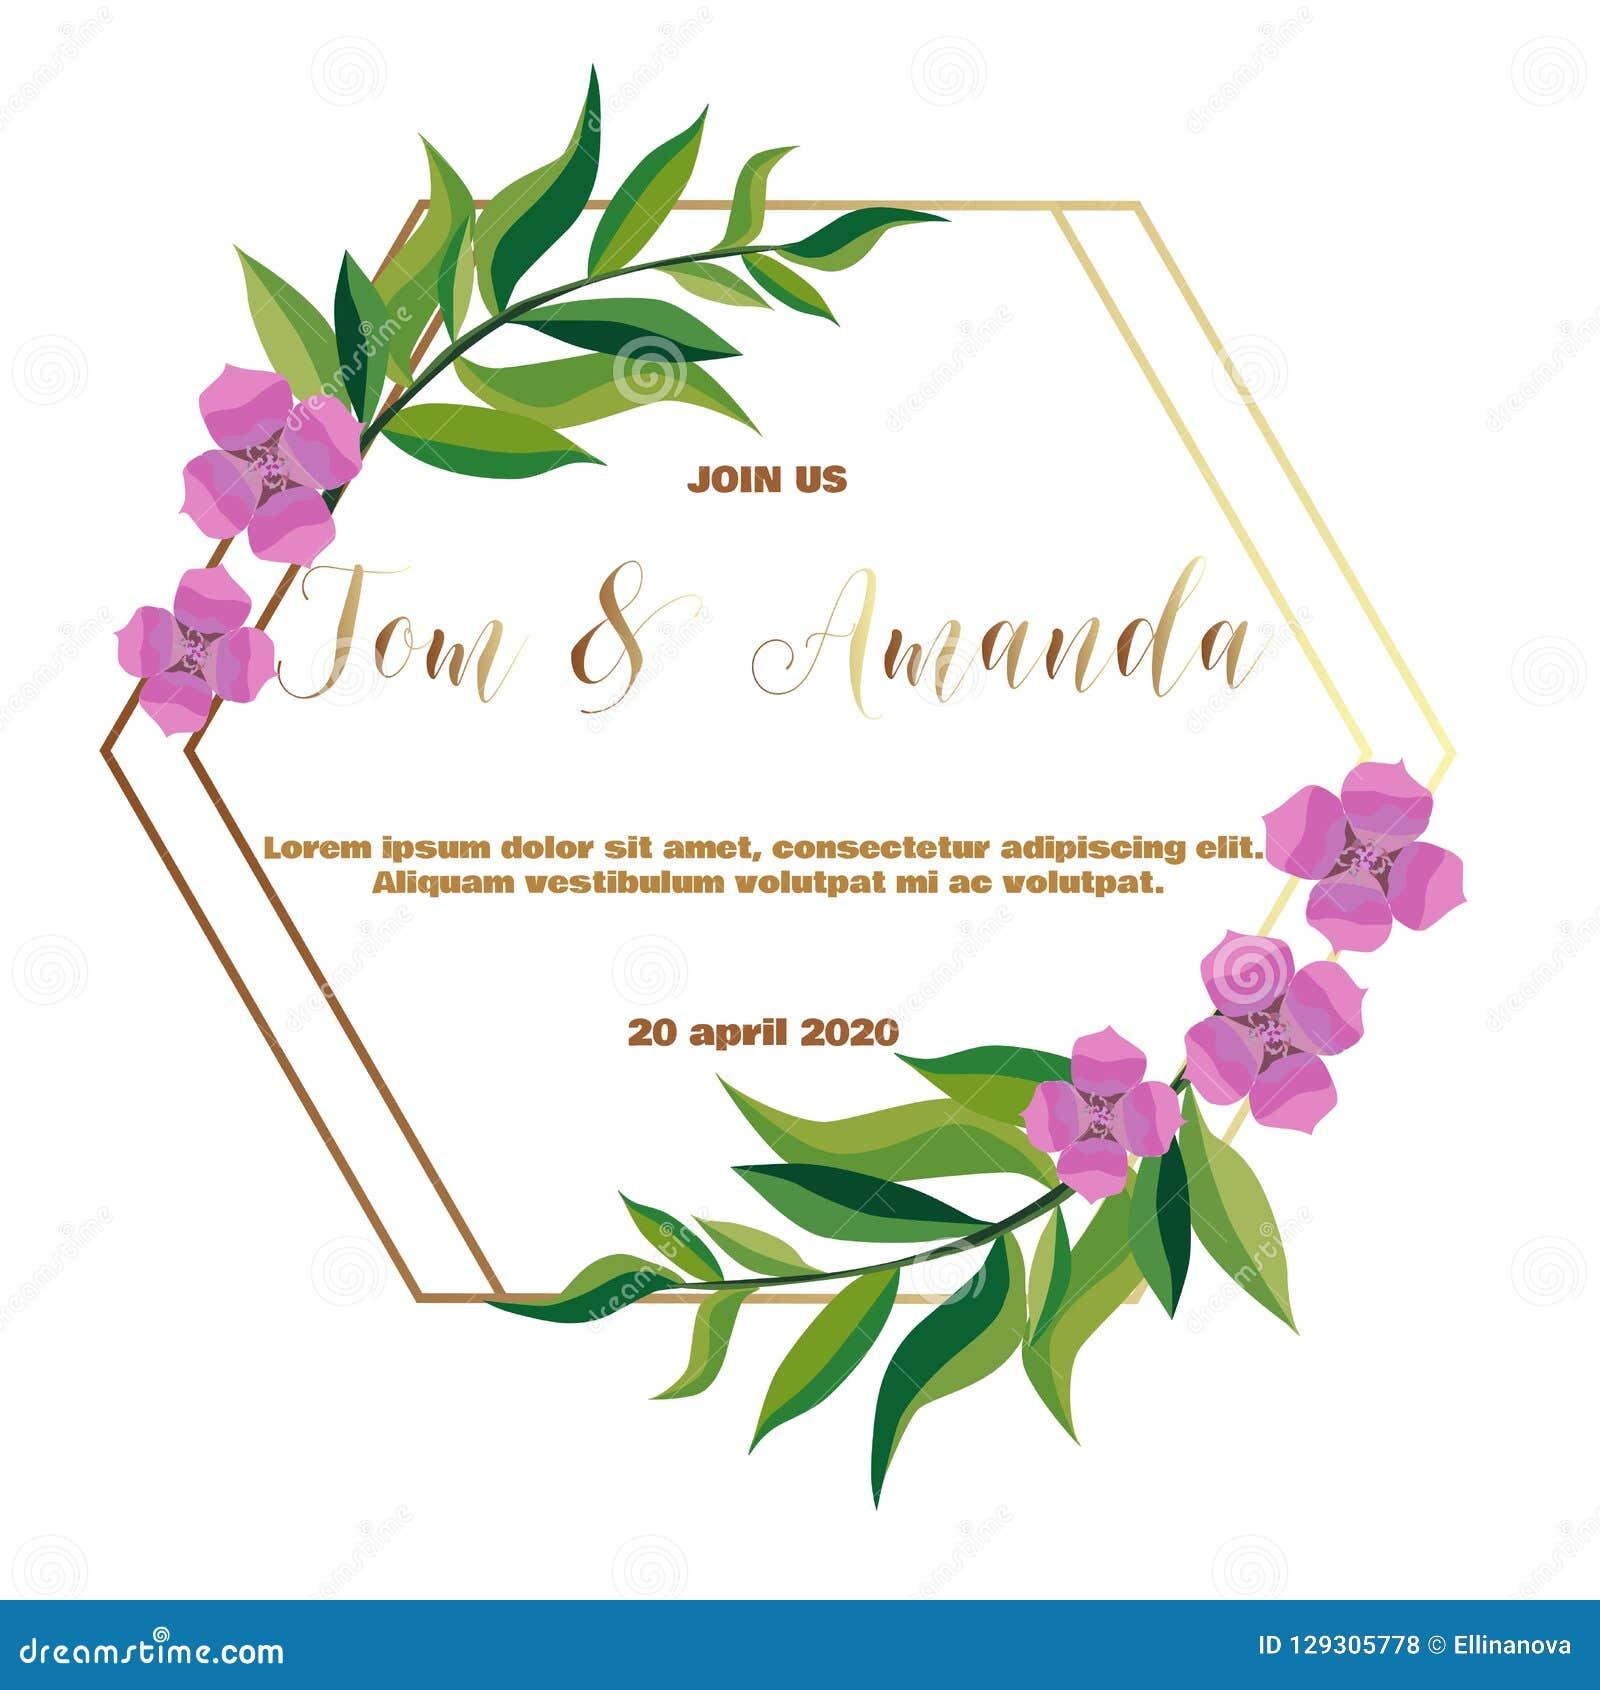 Greenery Wedding Invitation Template Stock Vector Illustration Of Greenery Cover 129305778